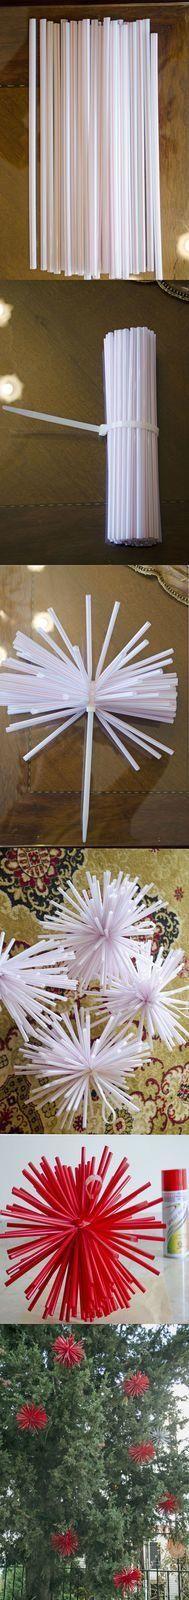 DIY : Décos de noël